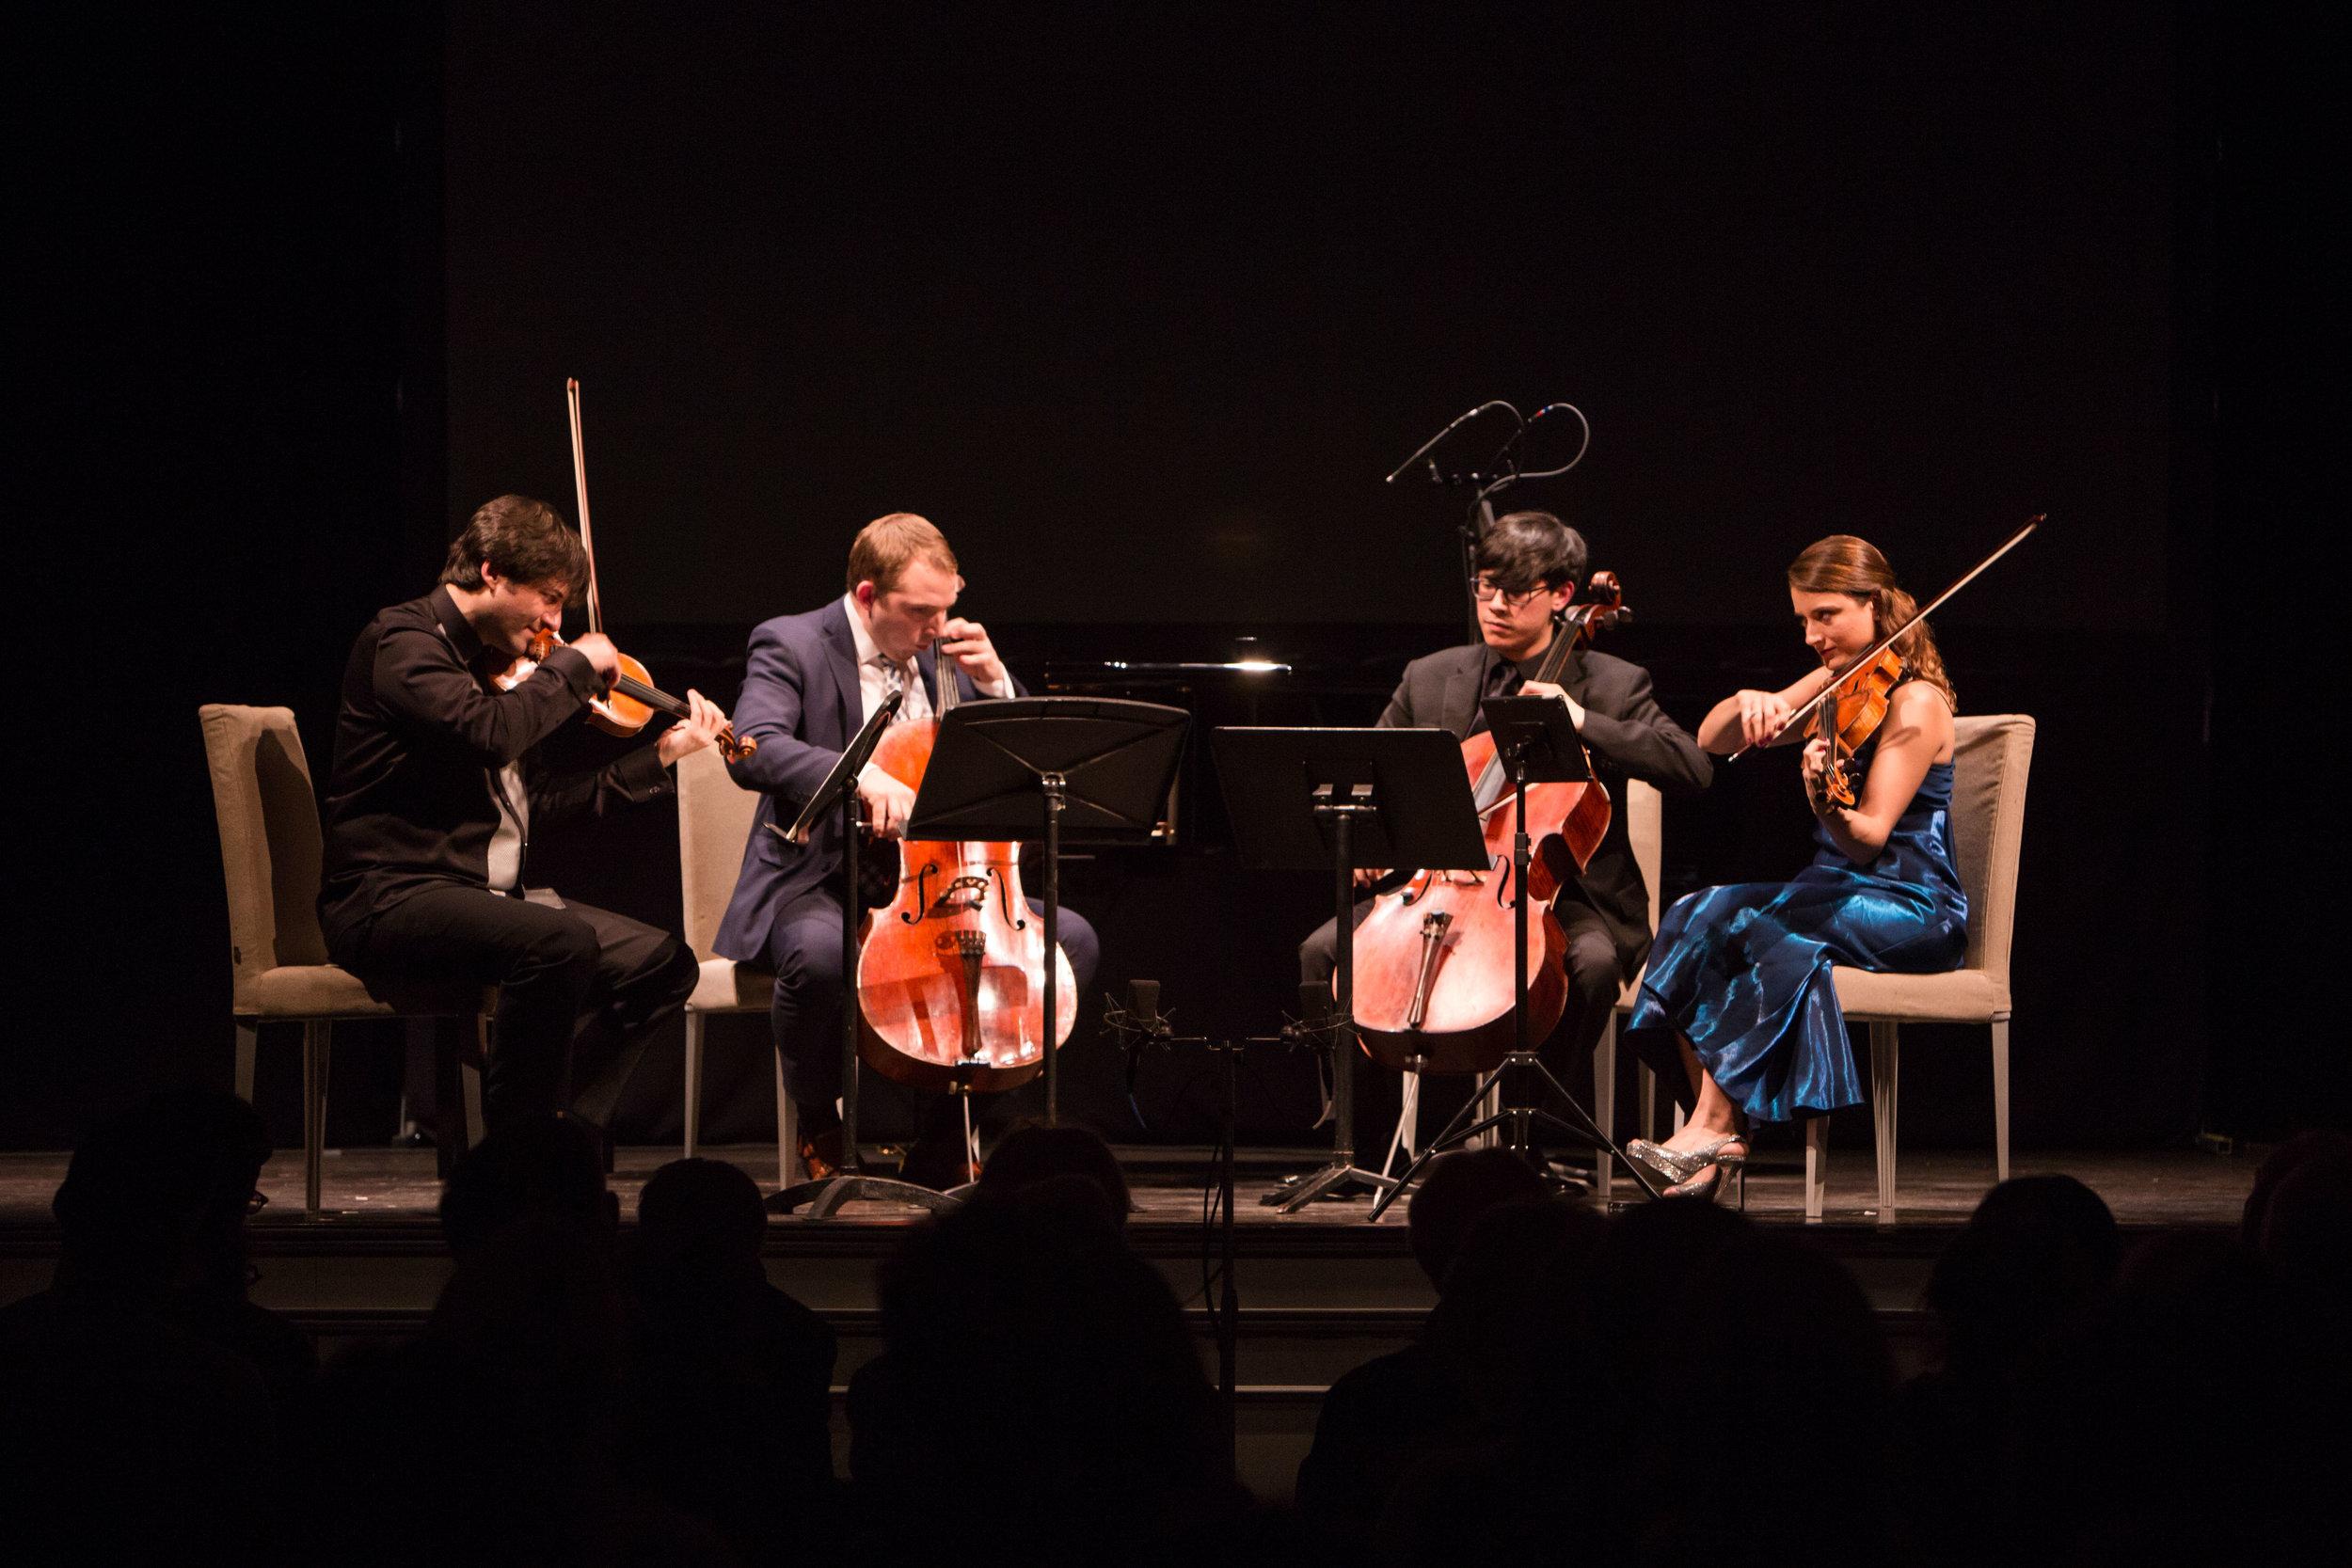 TANEYEV AND ARENSKY: IN TCHAIKOVSKY'S SHADOW  - February 7, 2018. bohemian national hallAlexander Kobrin, pianoPhilippe Quint, violinMilena Pajaro van de Stadt, violaZlatomir Fung, celloBrook Speltz, celloJi in Yang, violiIllustrated talk by Damian FowlerTaneyev - Piano Quintet in G minor, Op. 30Arensky - String Quartet No. 2 in A minor